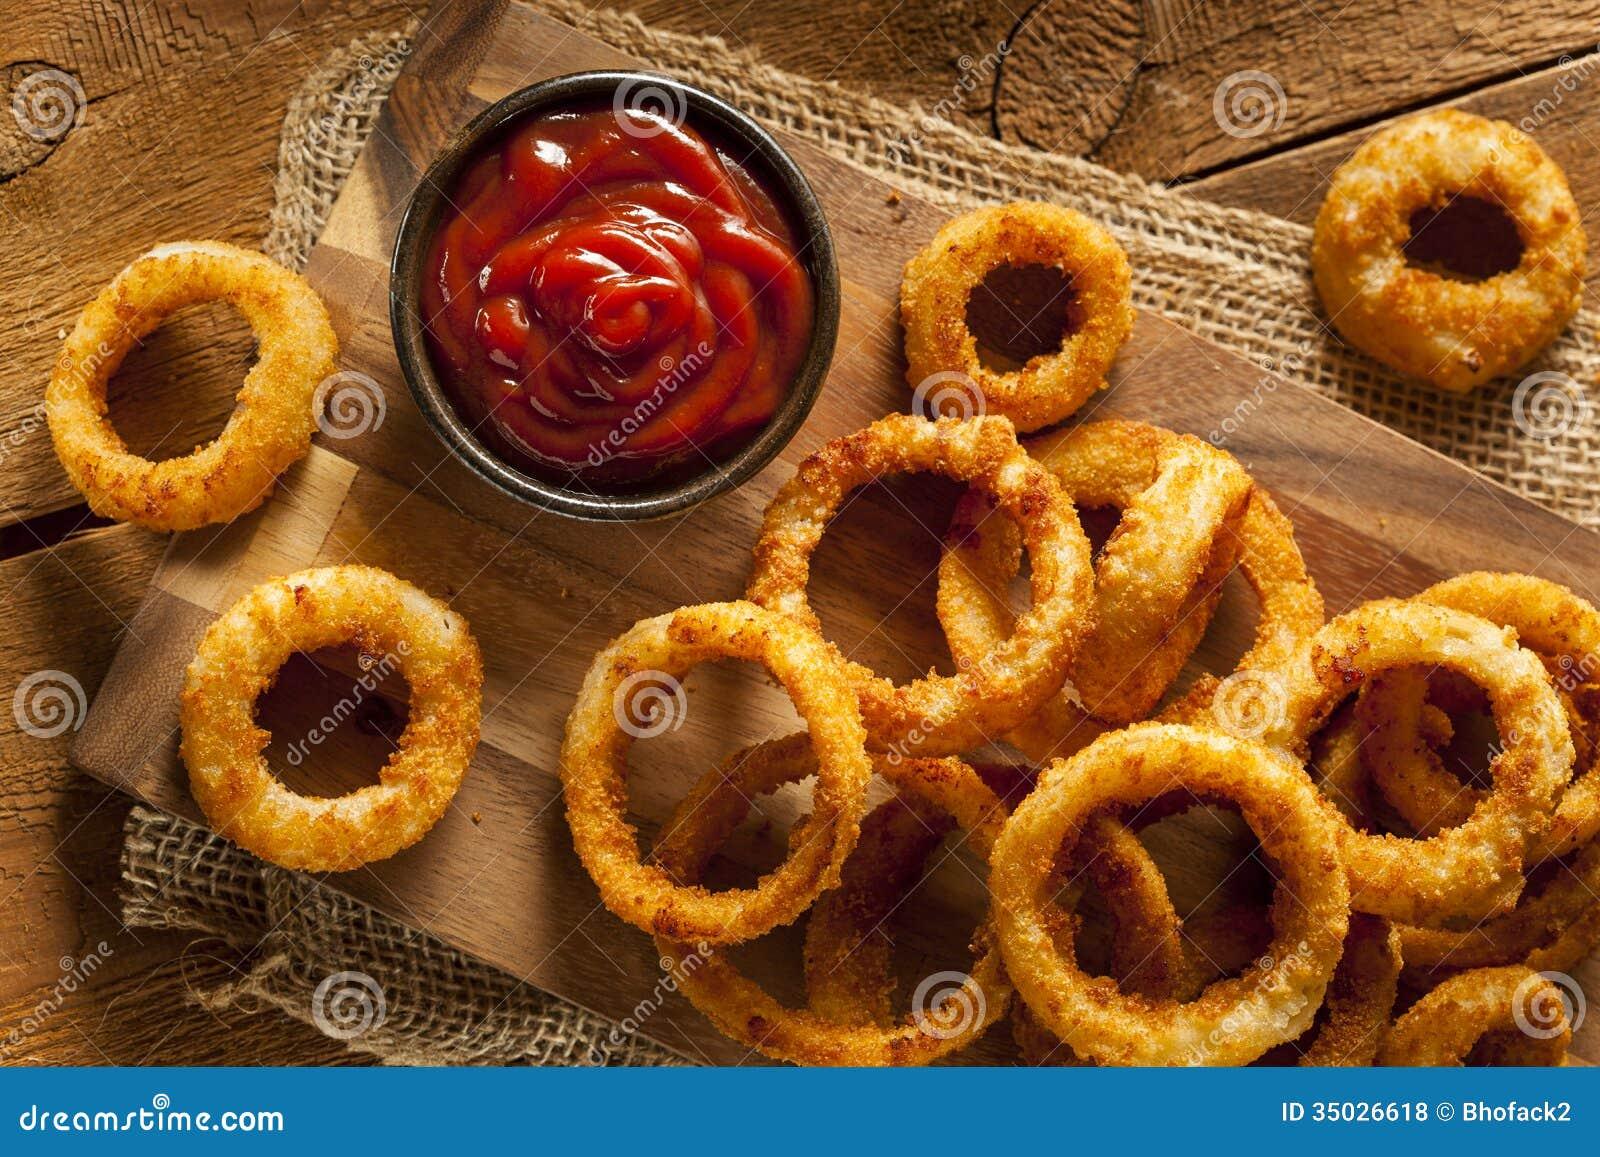 Fried Onion Rings croccante casalingo